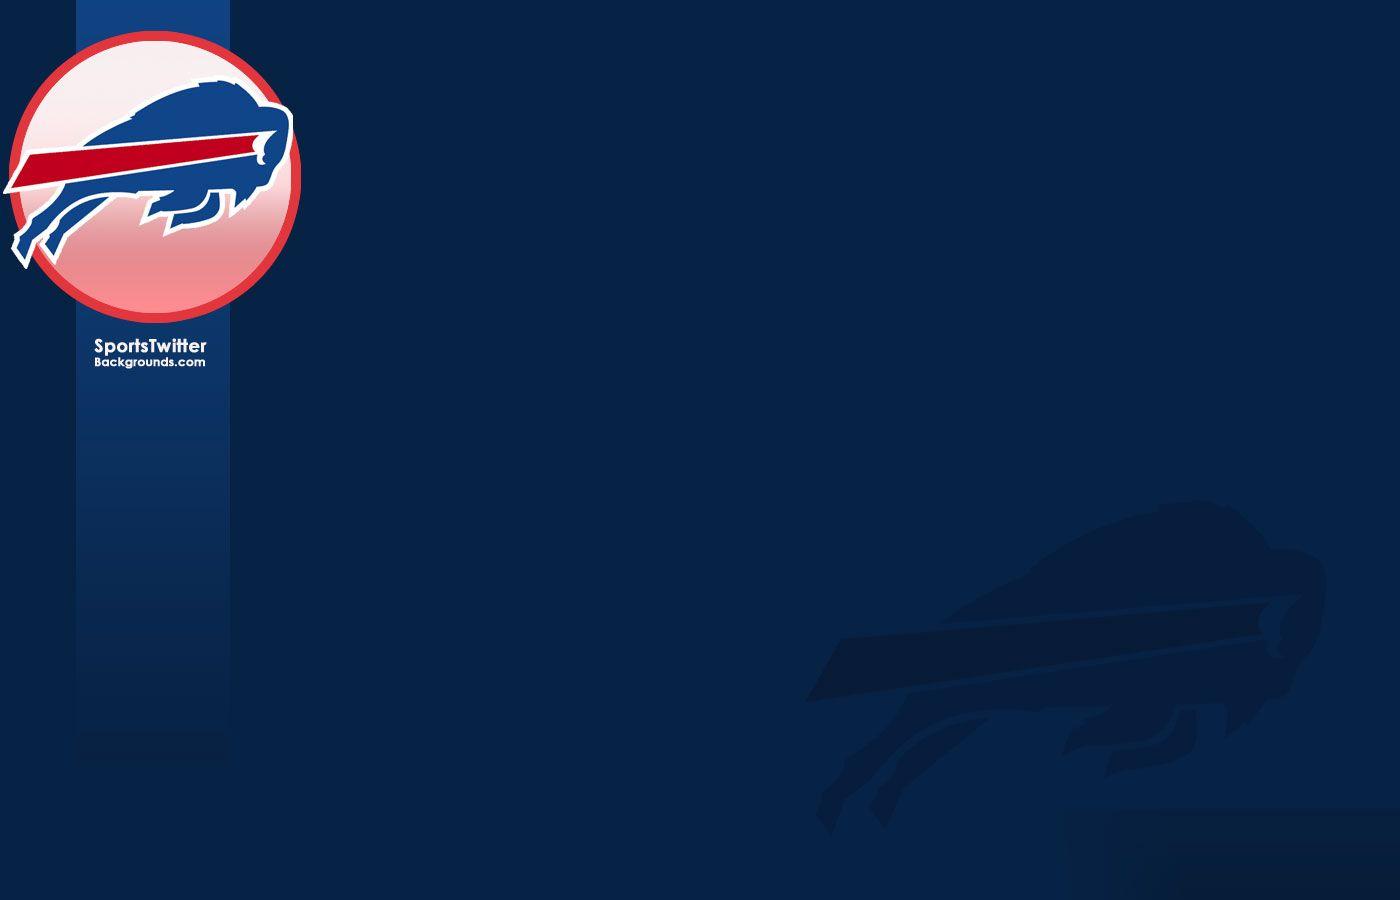 Buffalo Bills Buffalobills Buffalo Bills Bills Buffalo